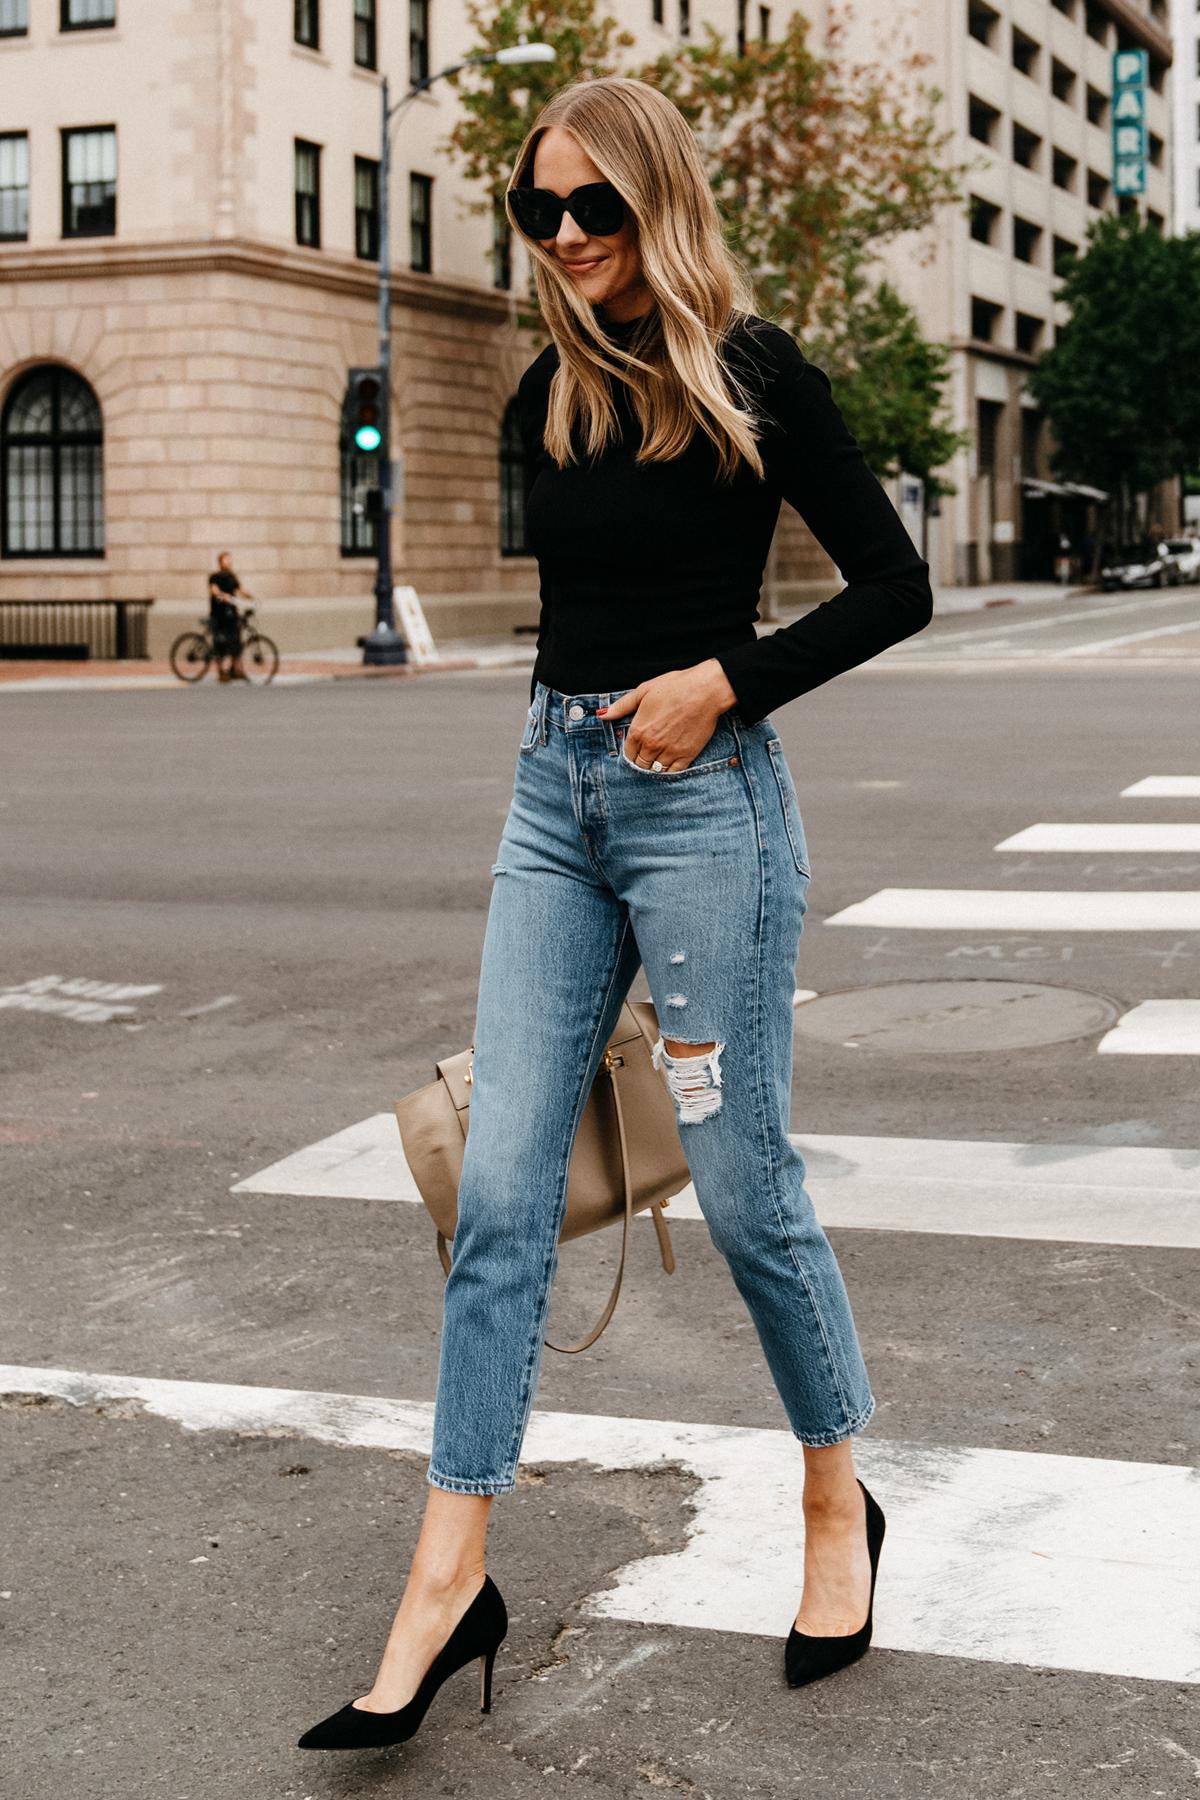 Fashion Jackson Wearing Black Bodysuit Levis Ripped Jeans Black Pumps Street Style